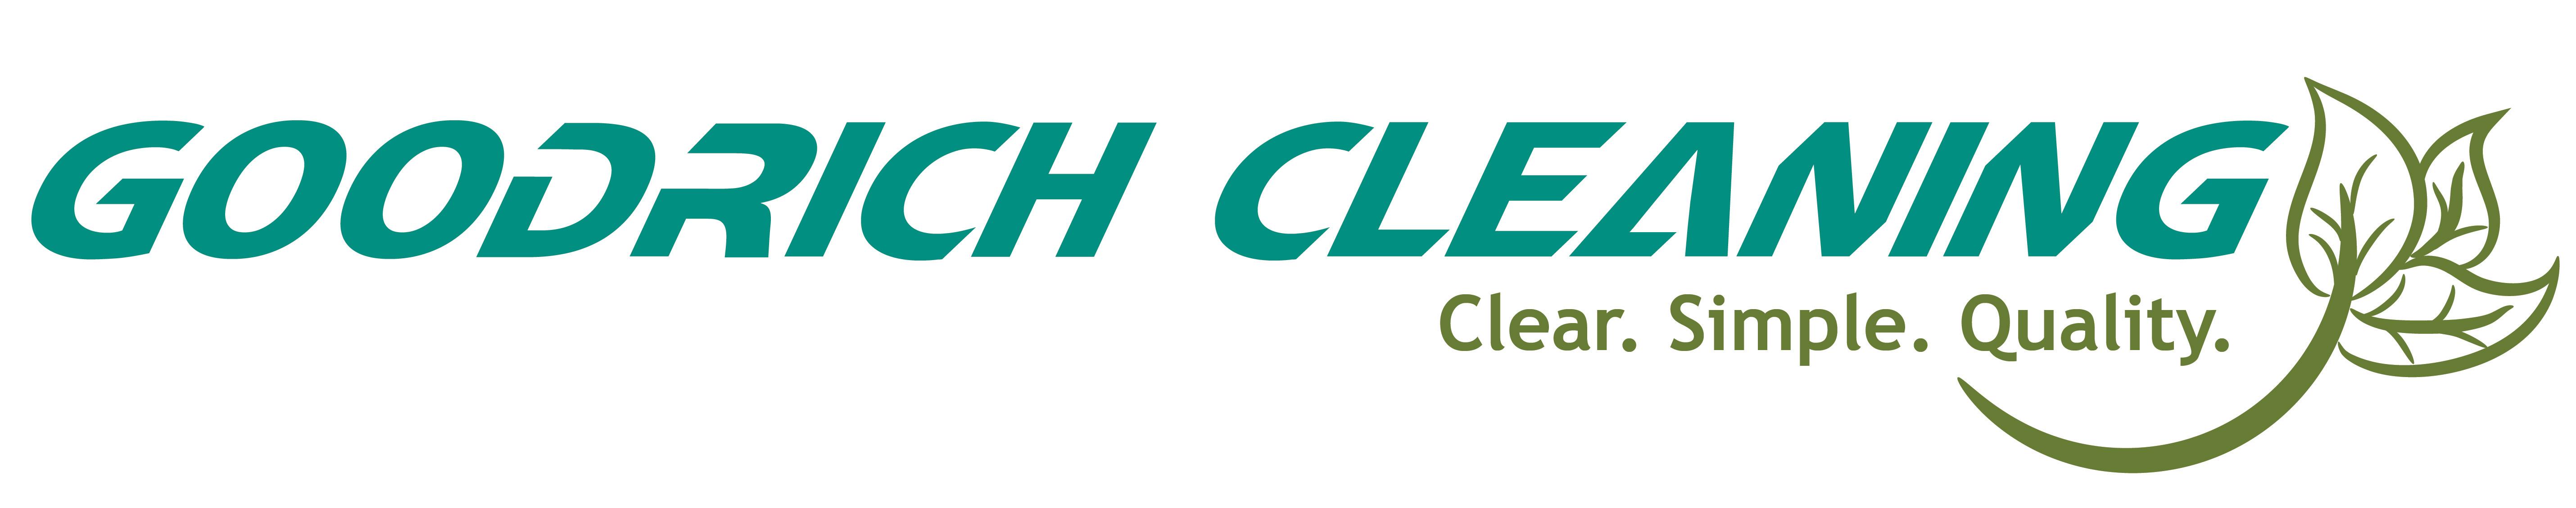 Goodrich Cleaning Logo